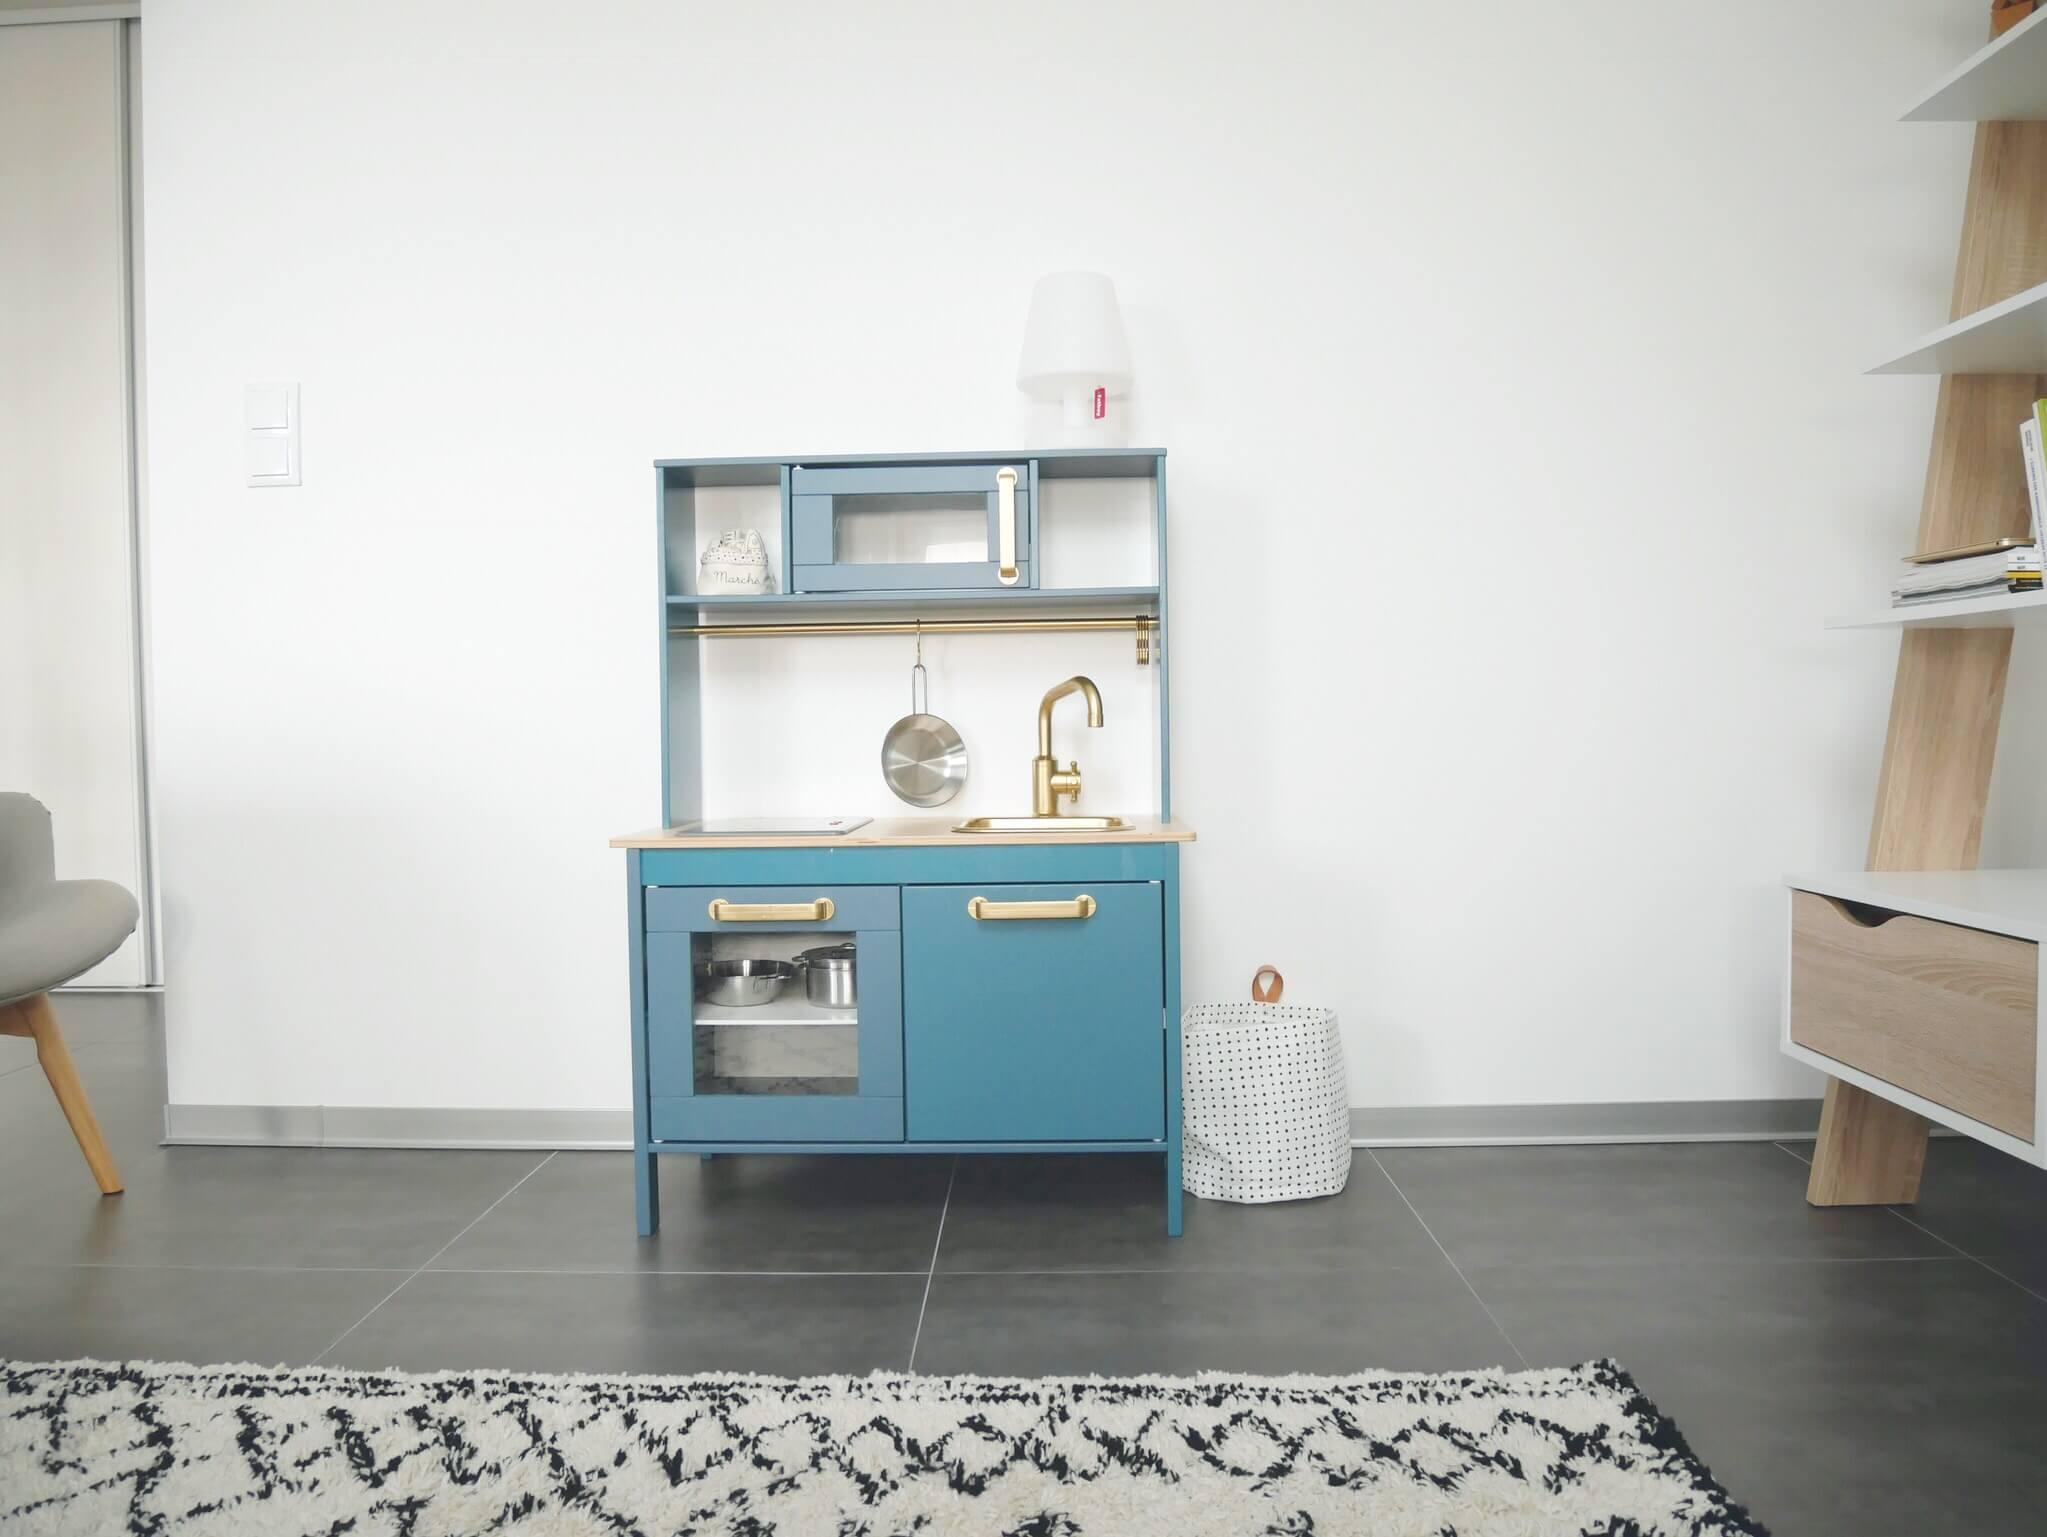 diy pimp my duktig le relooking de la cuisine enfant d 39 ikea. Black Bedroom Furniture Sets. Home Design Ideas